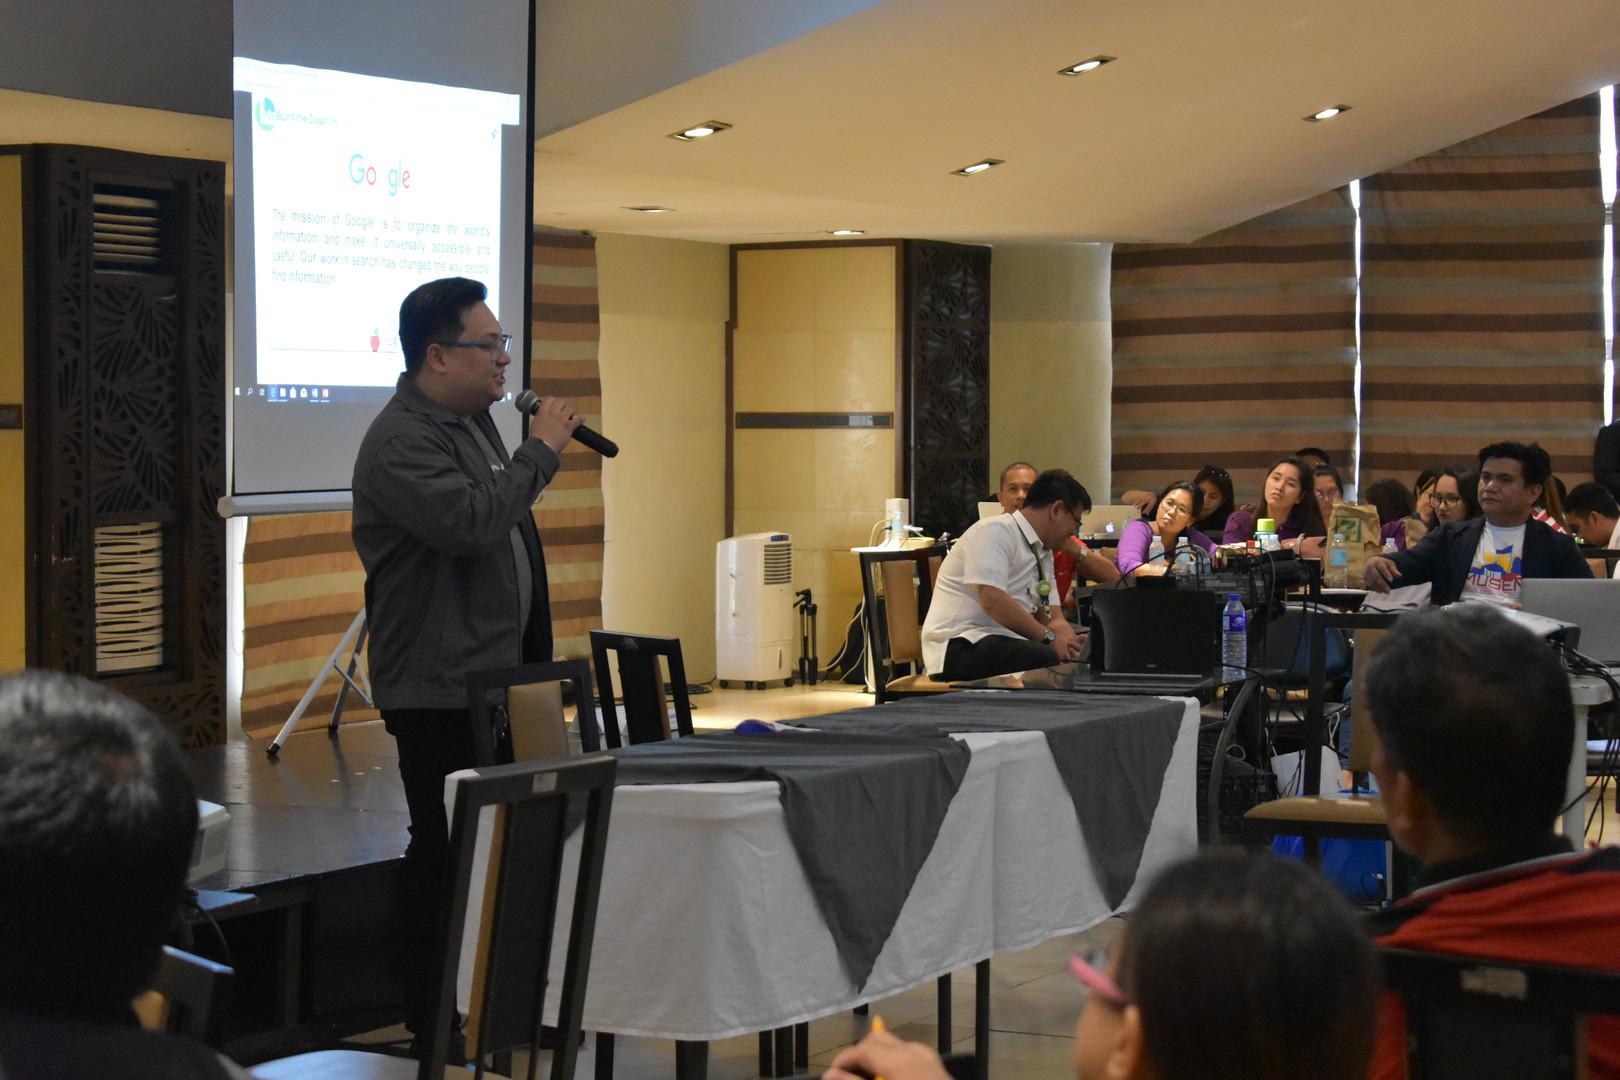 Mr. Adrian C. Cruz, and Educational Technology Specialist